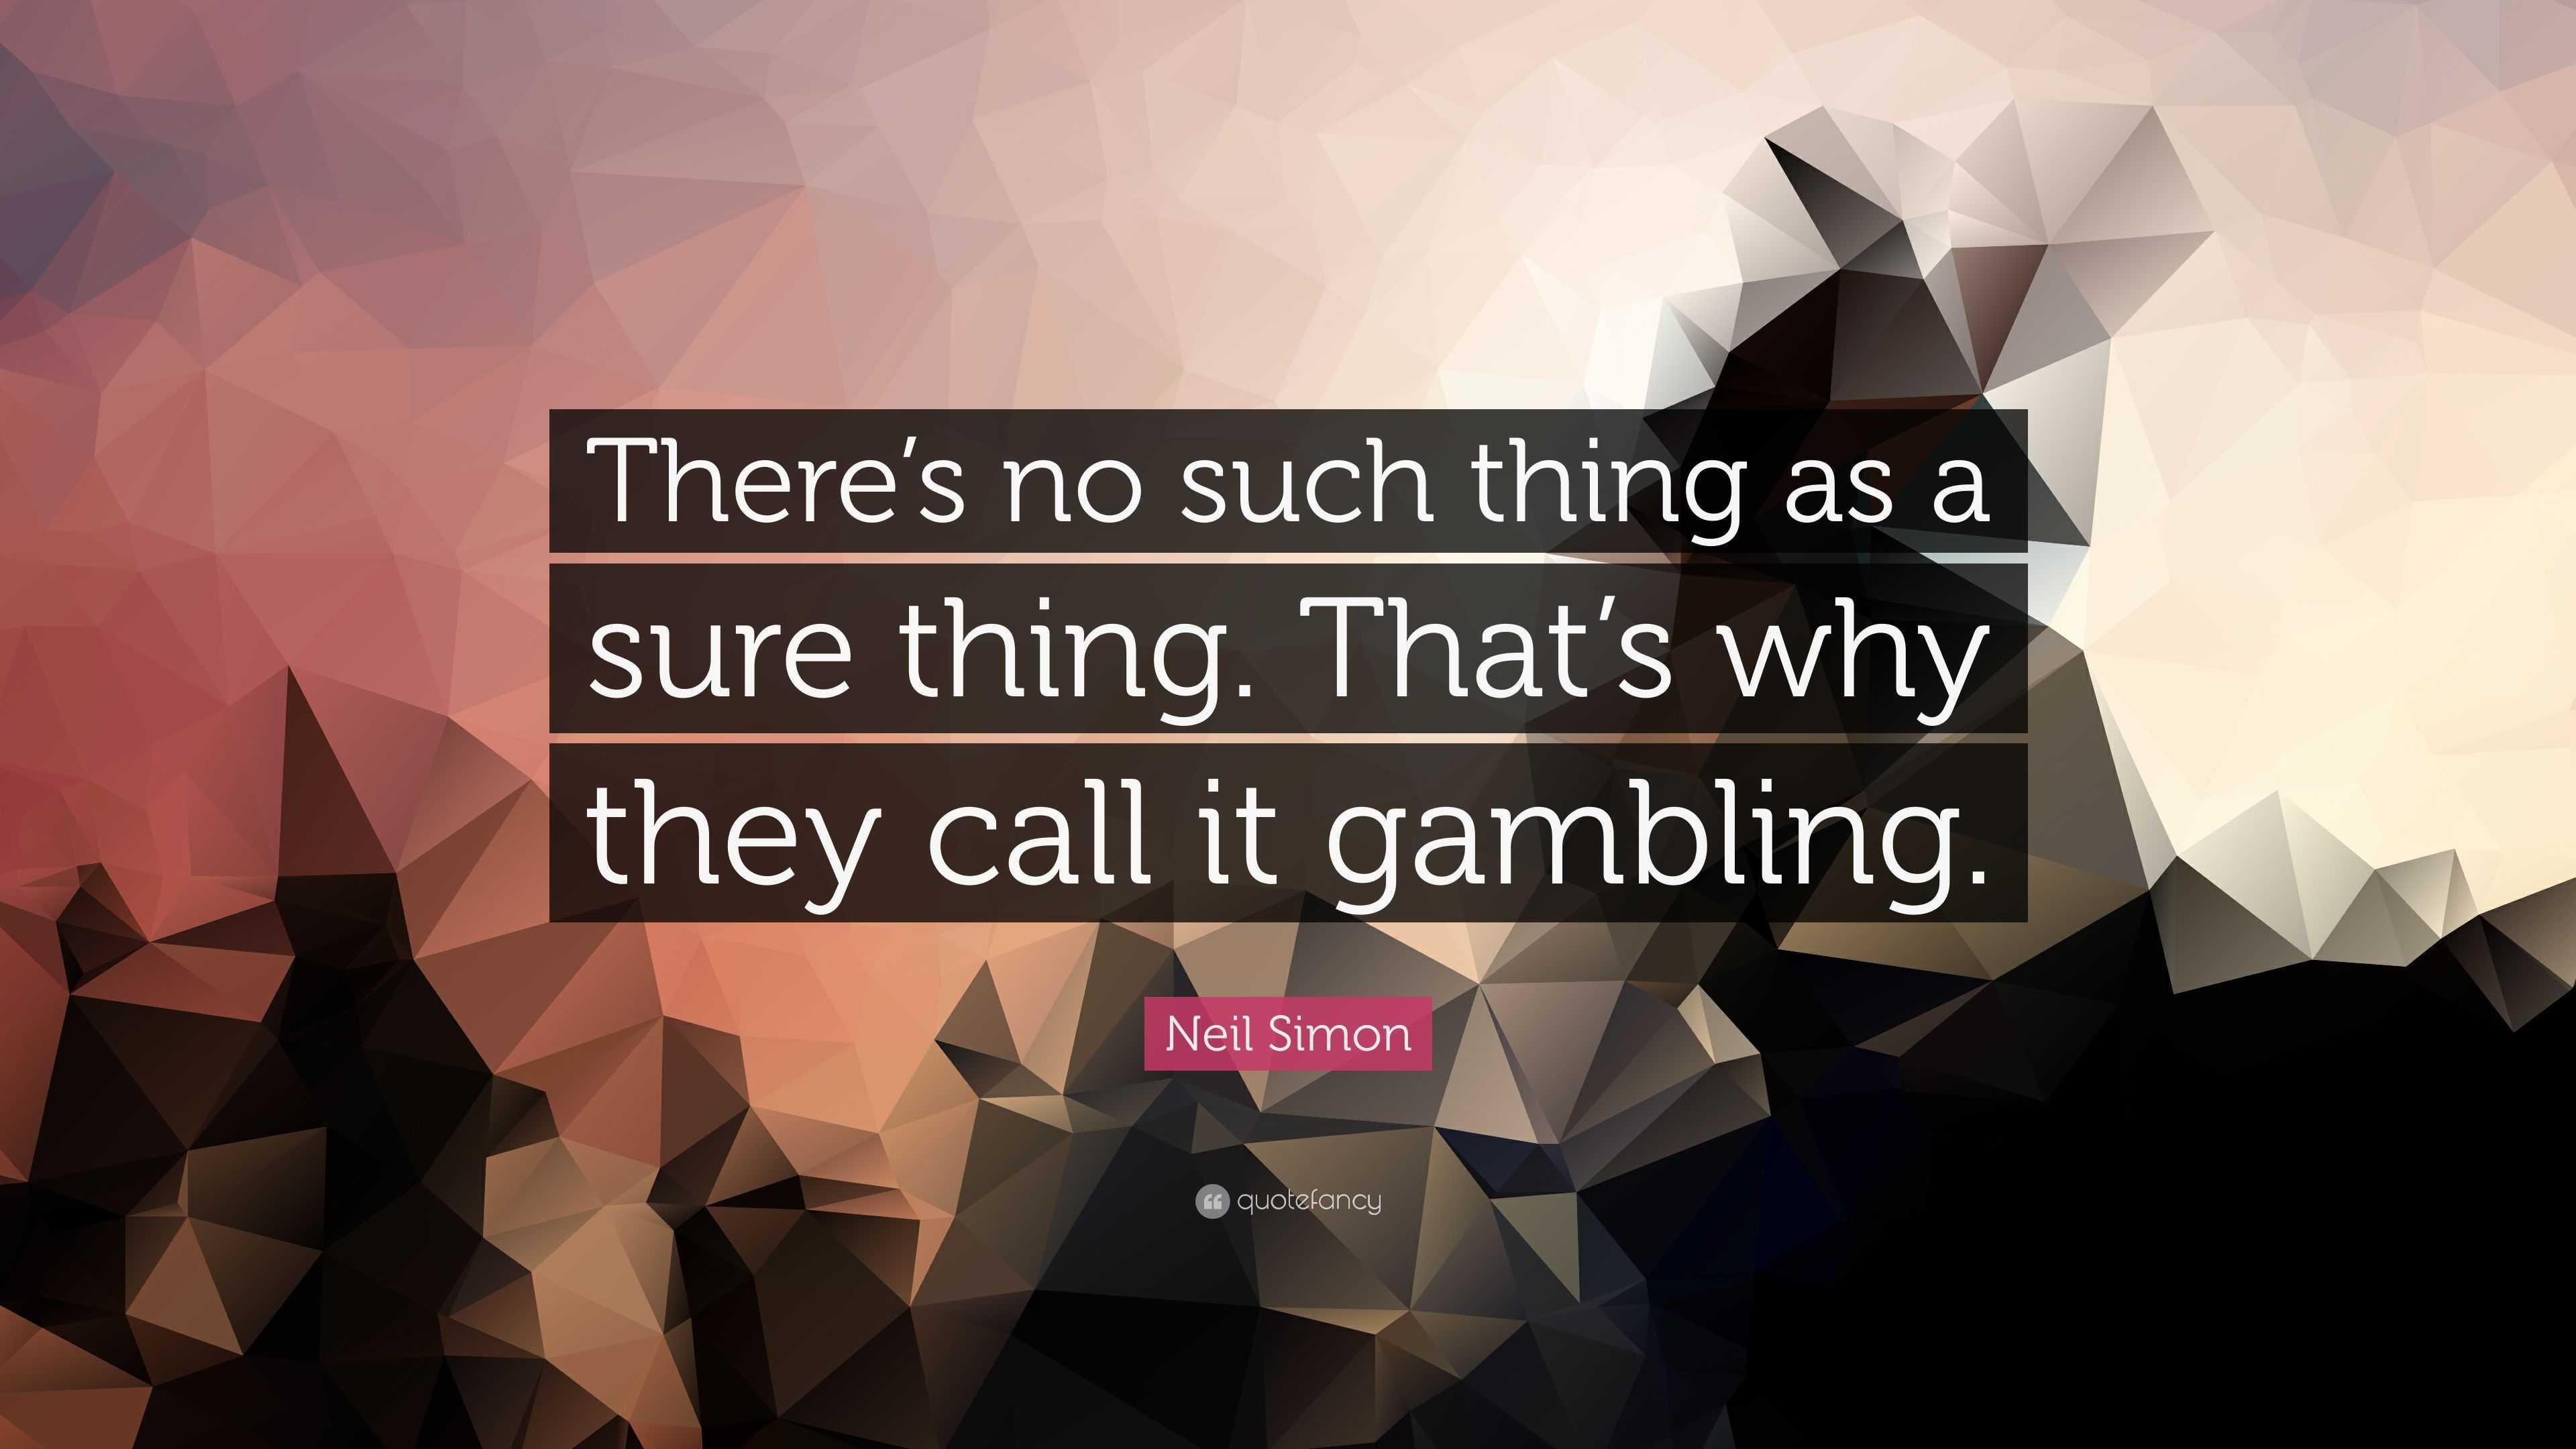 No gambling wallpaper gayle jones procter gamble